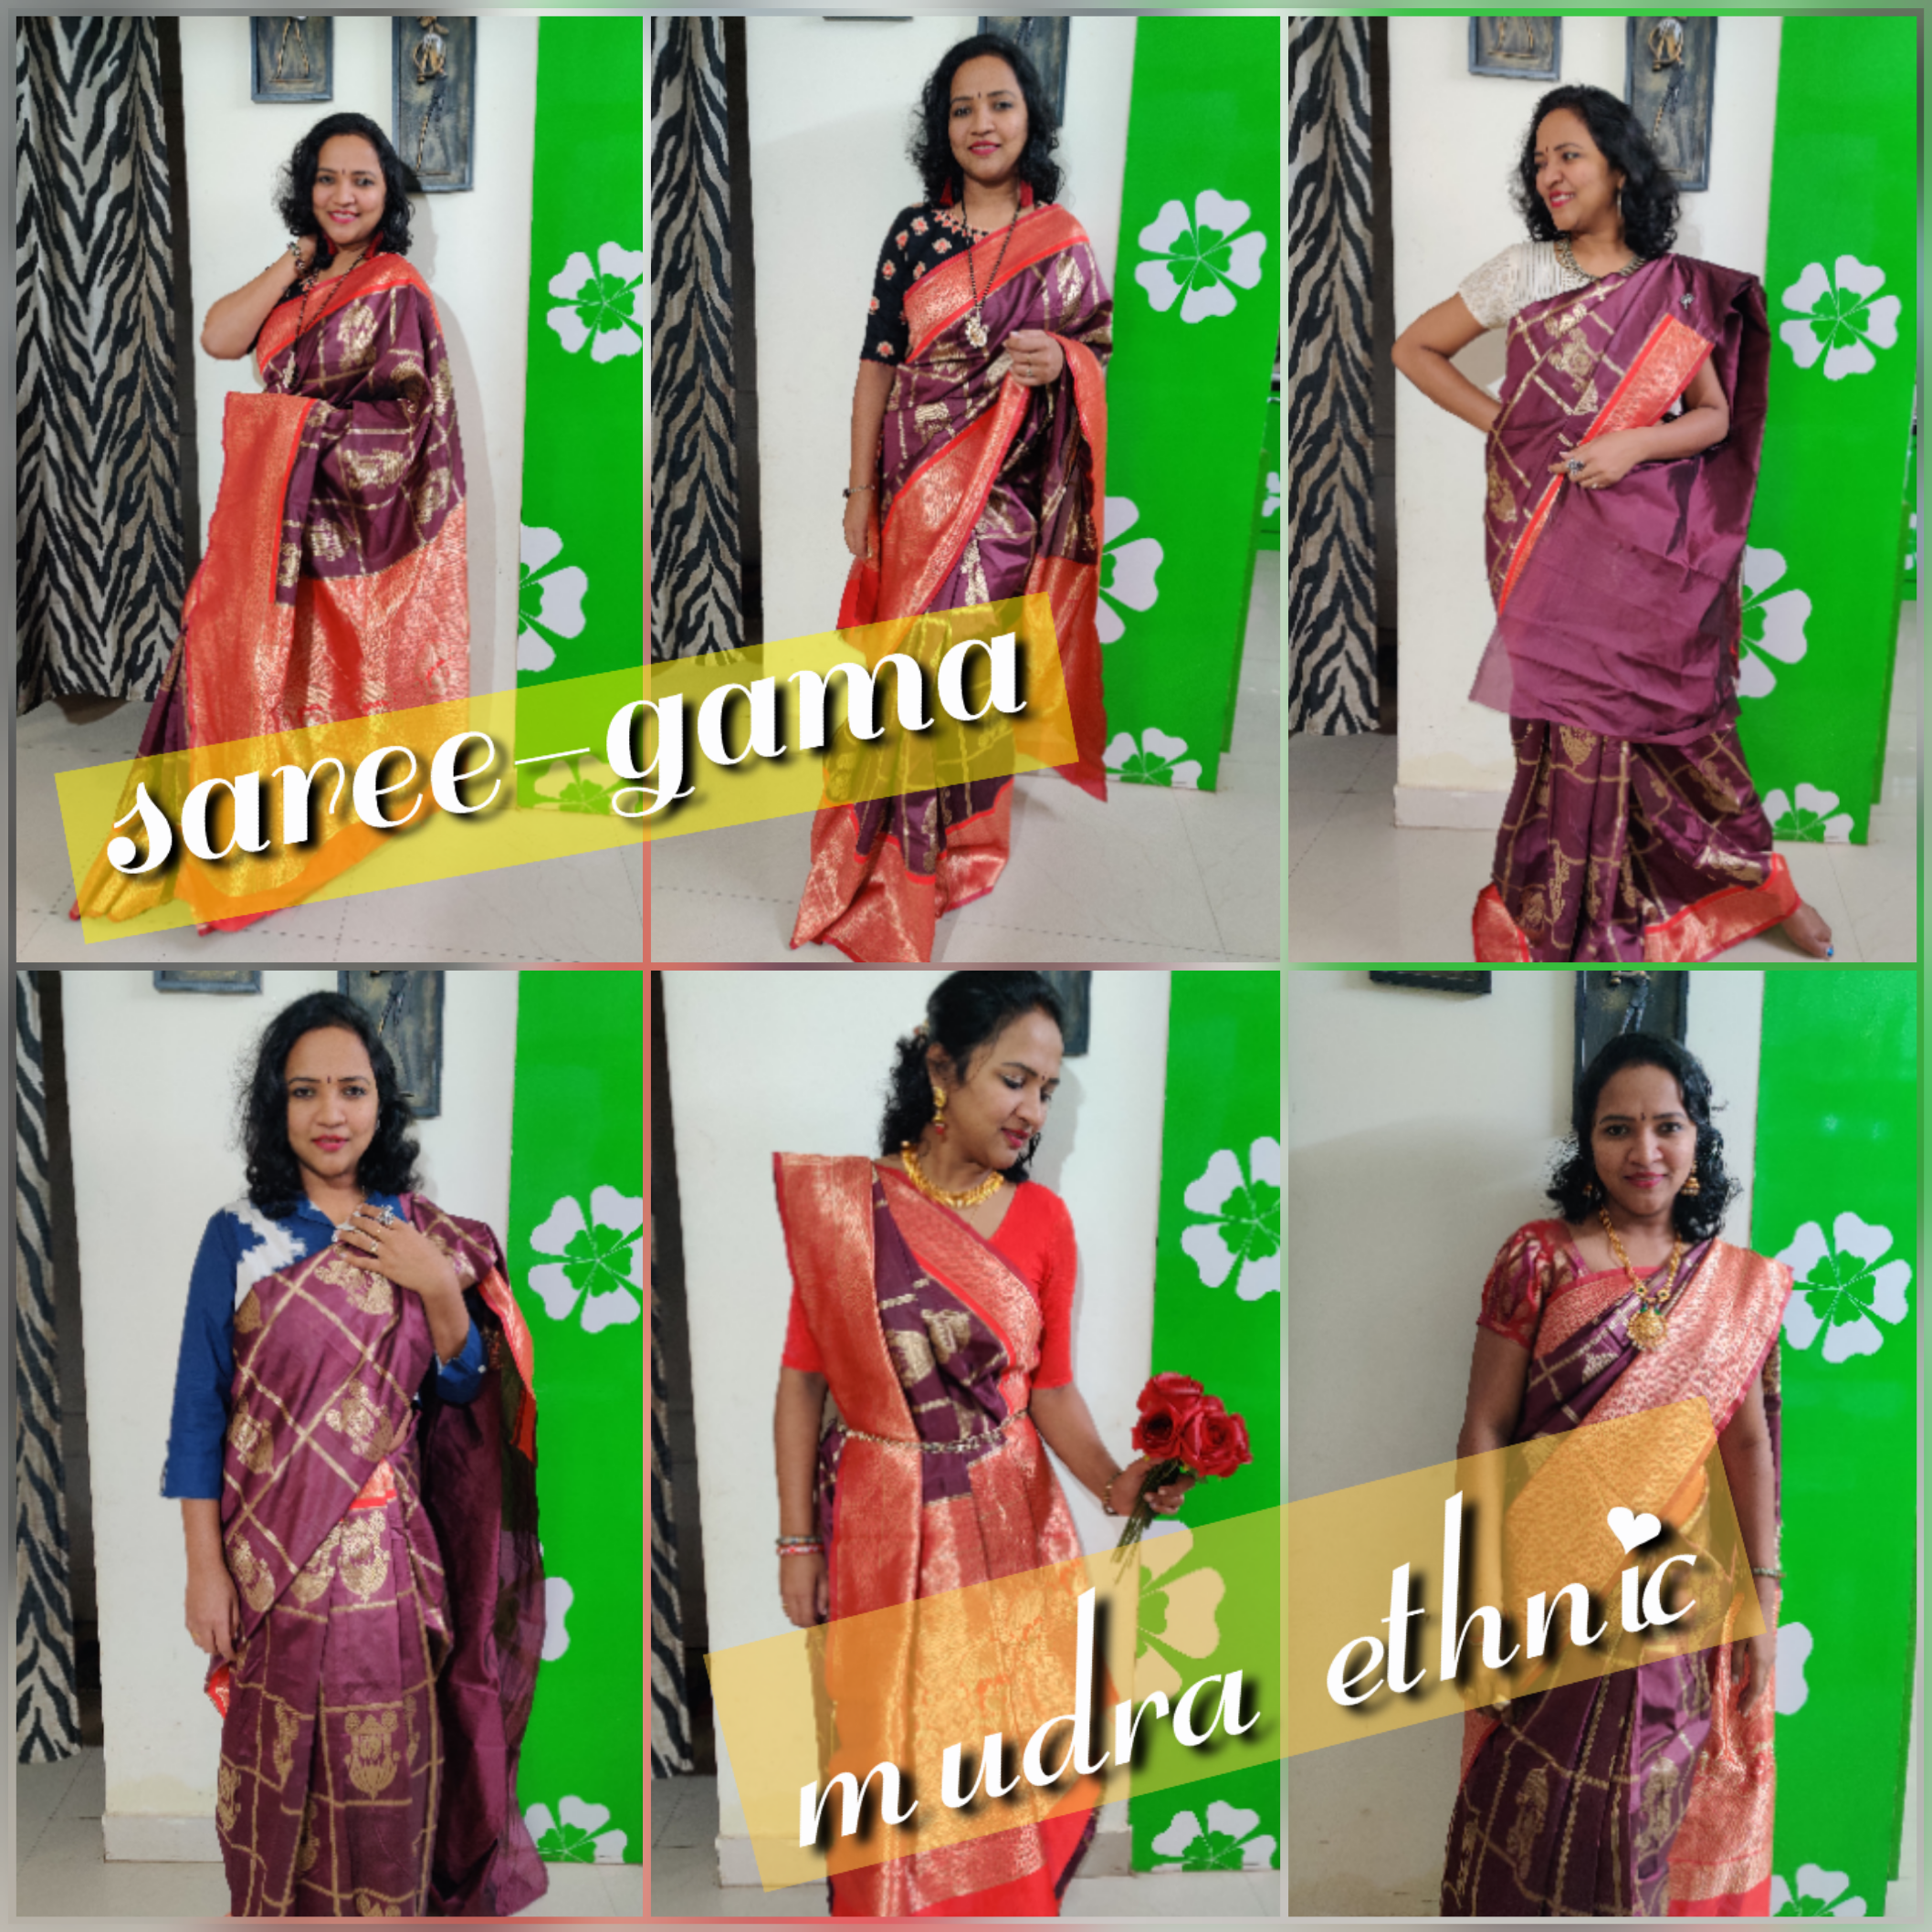 Saree-gama mudra ethnic